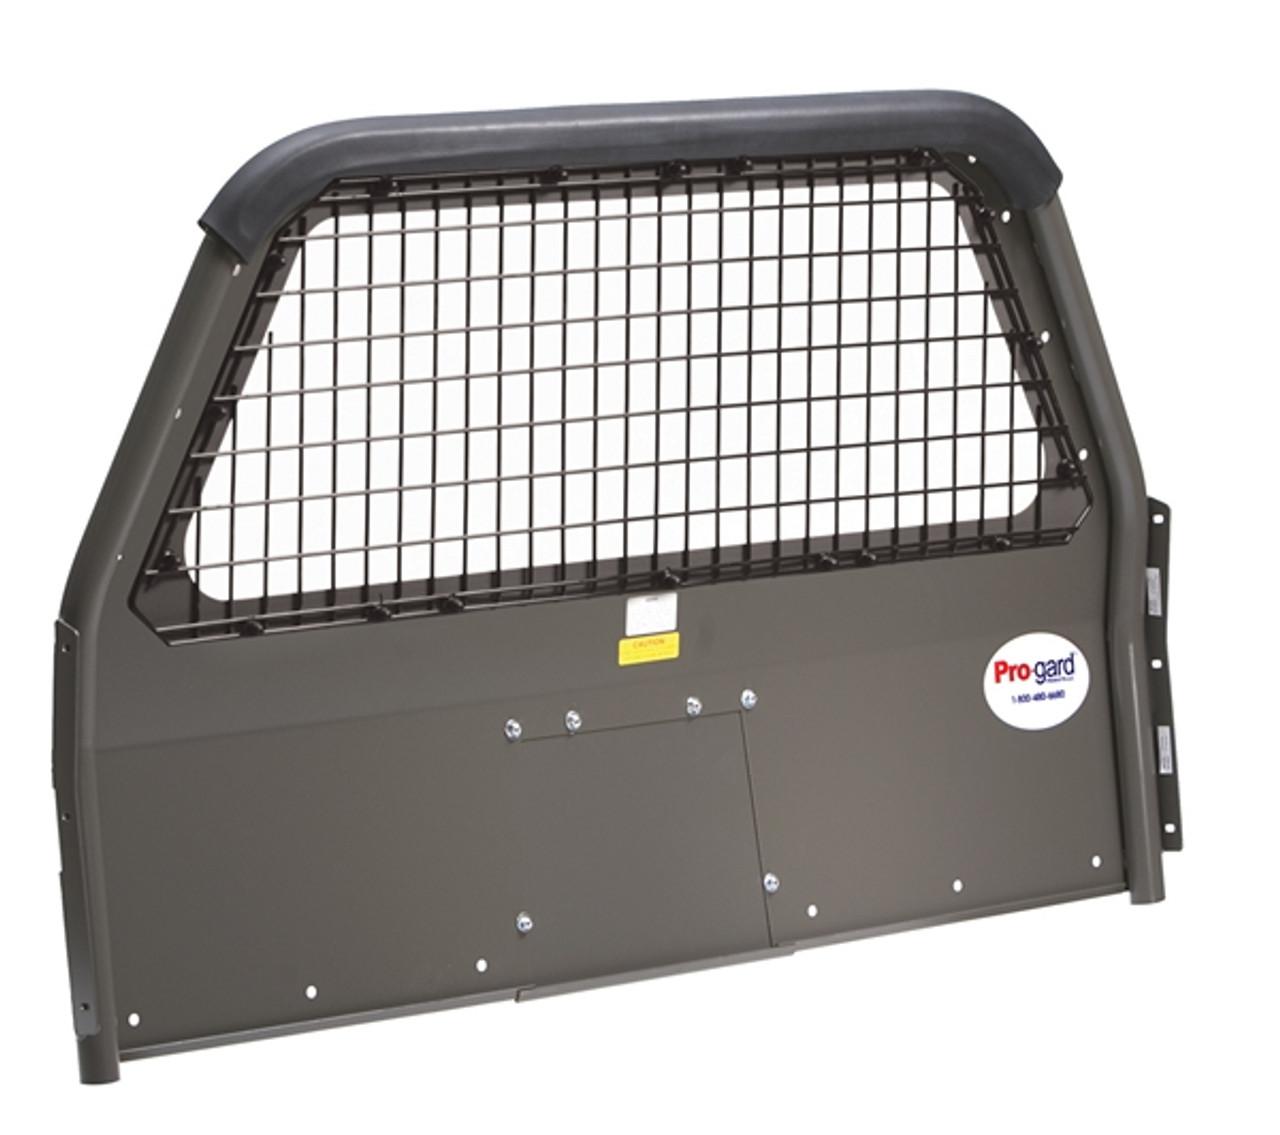 Caprice Police Prisoner Transport Partition Cage by Progard